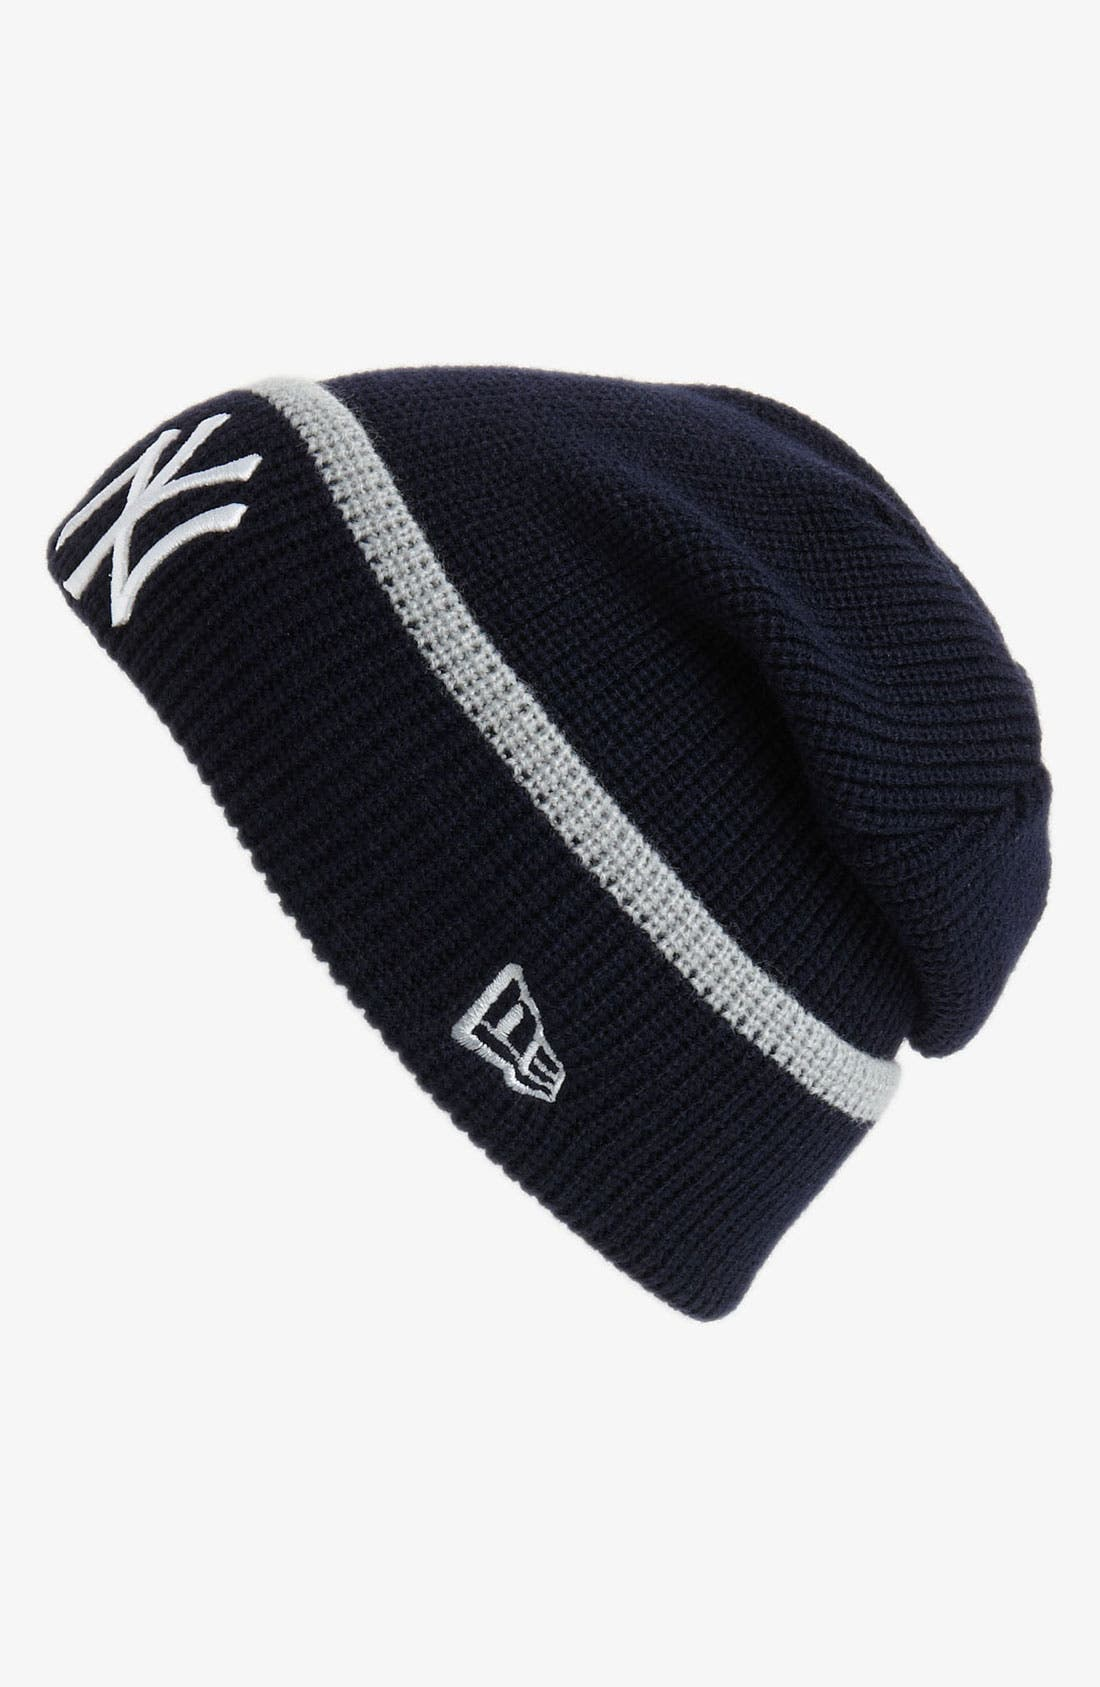 Alternate Image 1 Selected - New Era Cap 'New York Yankees' Pop-Cuff Knit Beanie